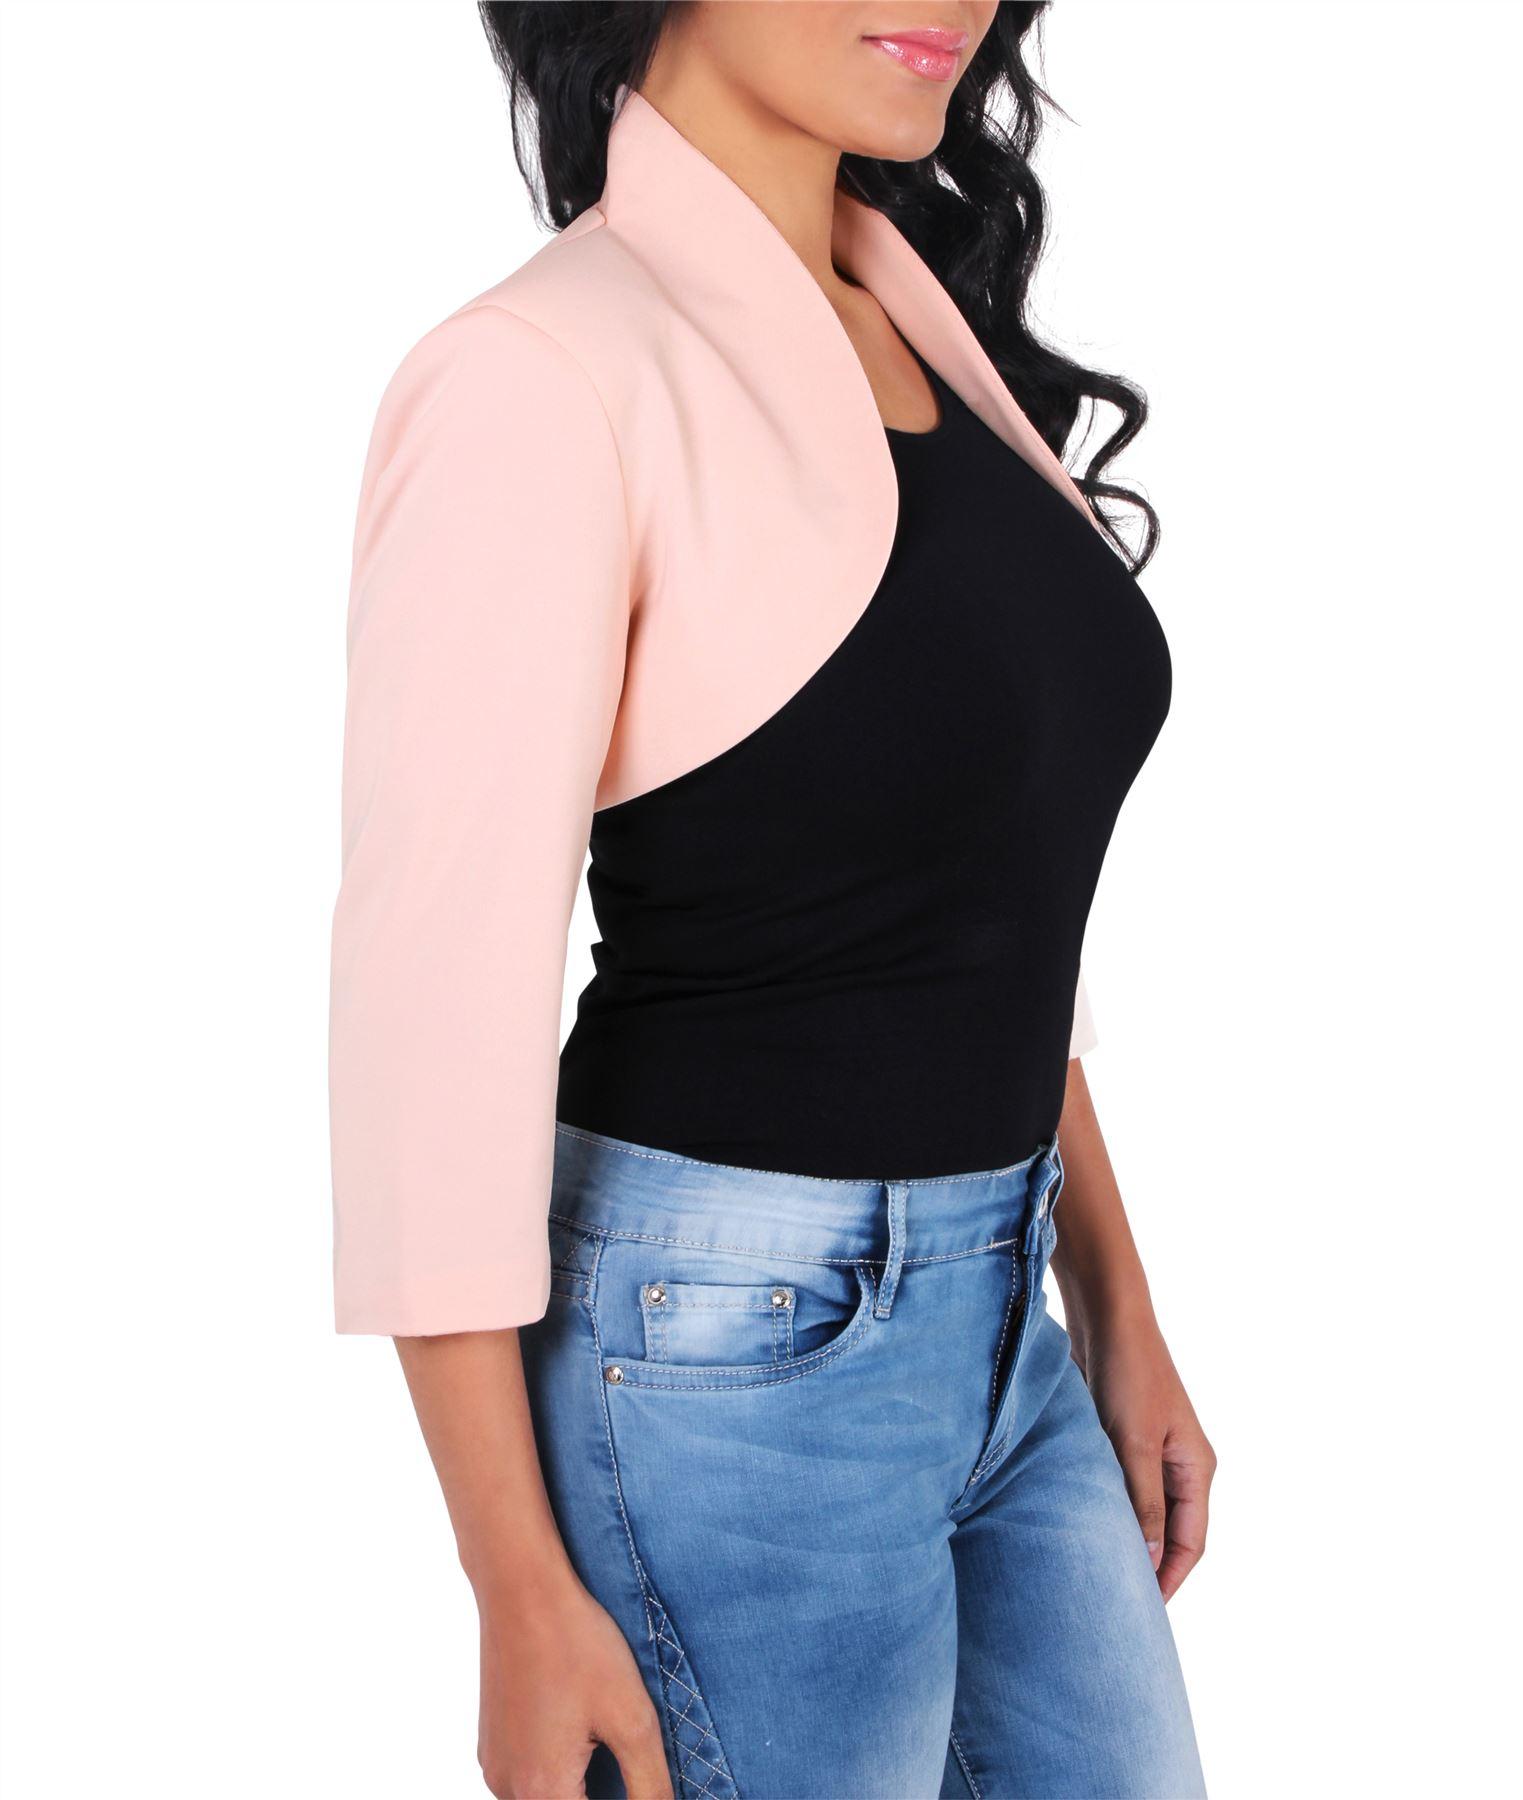 Womens-Tailored-Bolero-Shrug-Cropped-Top-Short-Sleeve-Party-Blazer-Jacket-Coat thumbnail 10